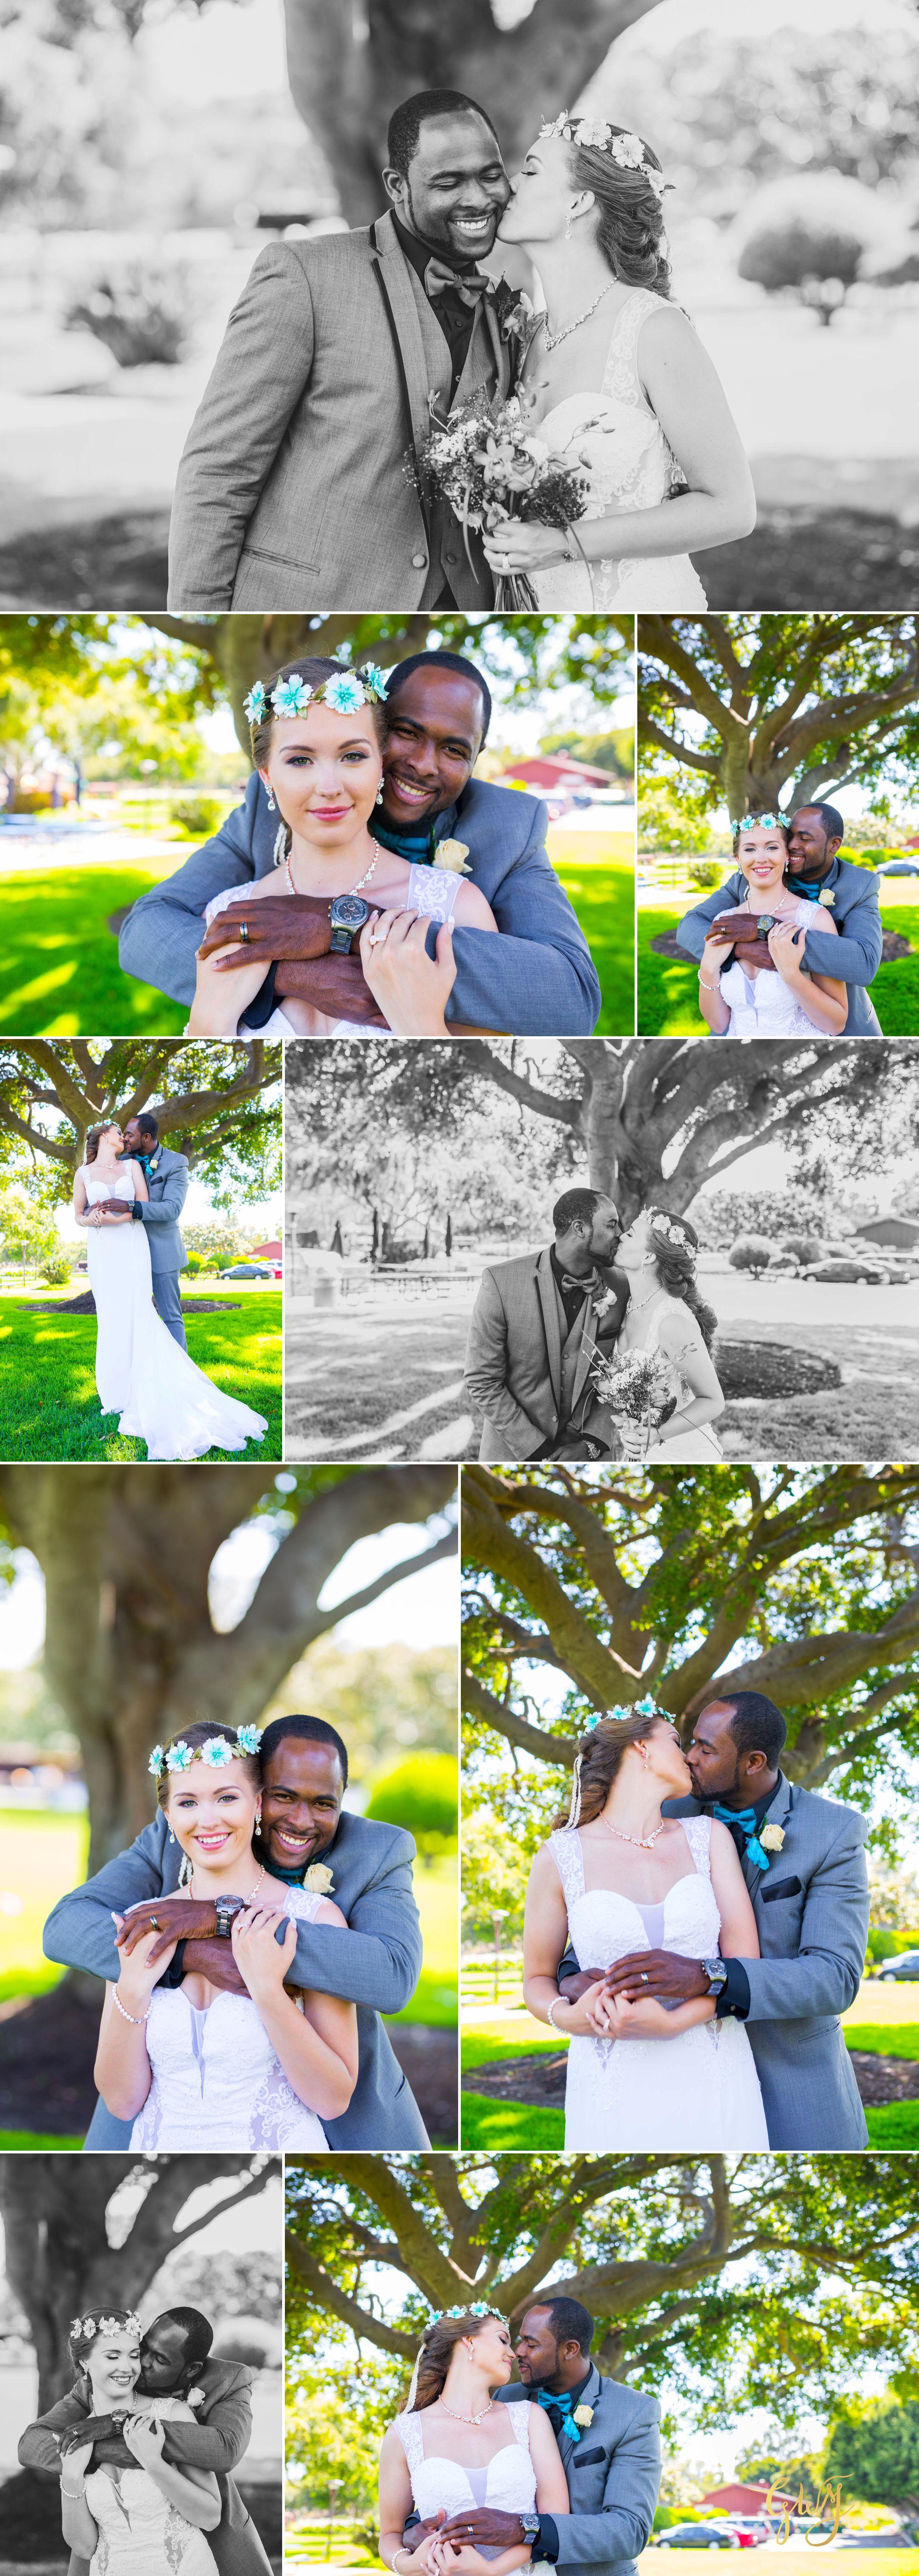 Rebecca + Torand El Segundo Chevron Employee Park Summer Barbados Bajan Wedding by Glass Woods Media 9.jpg